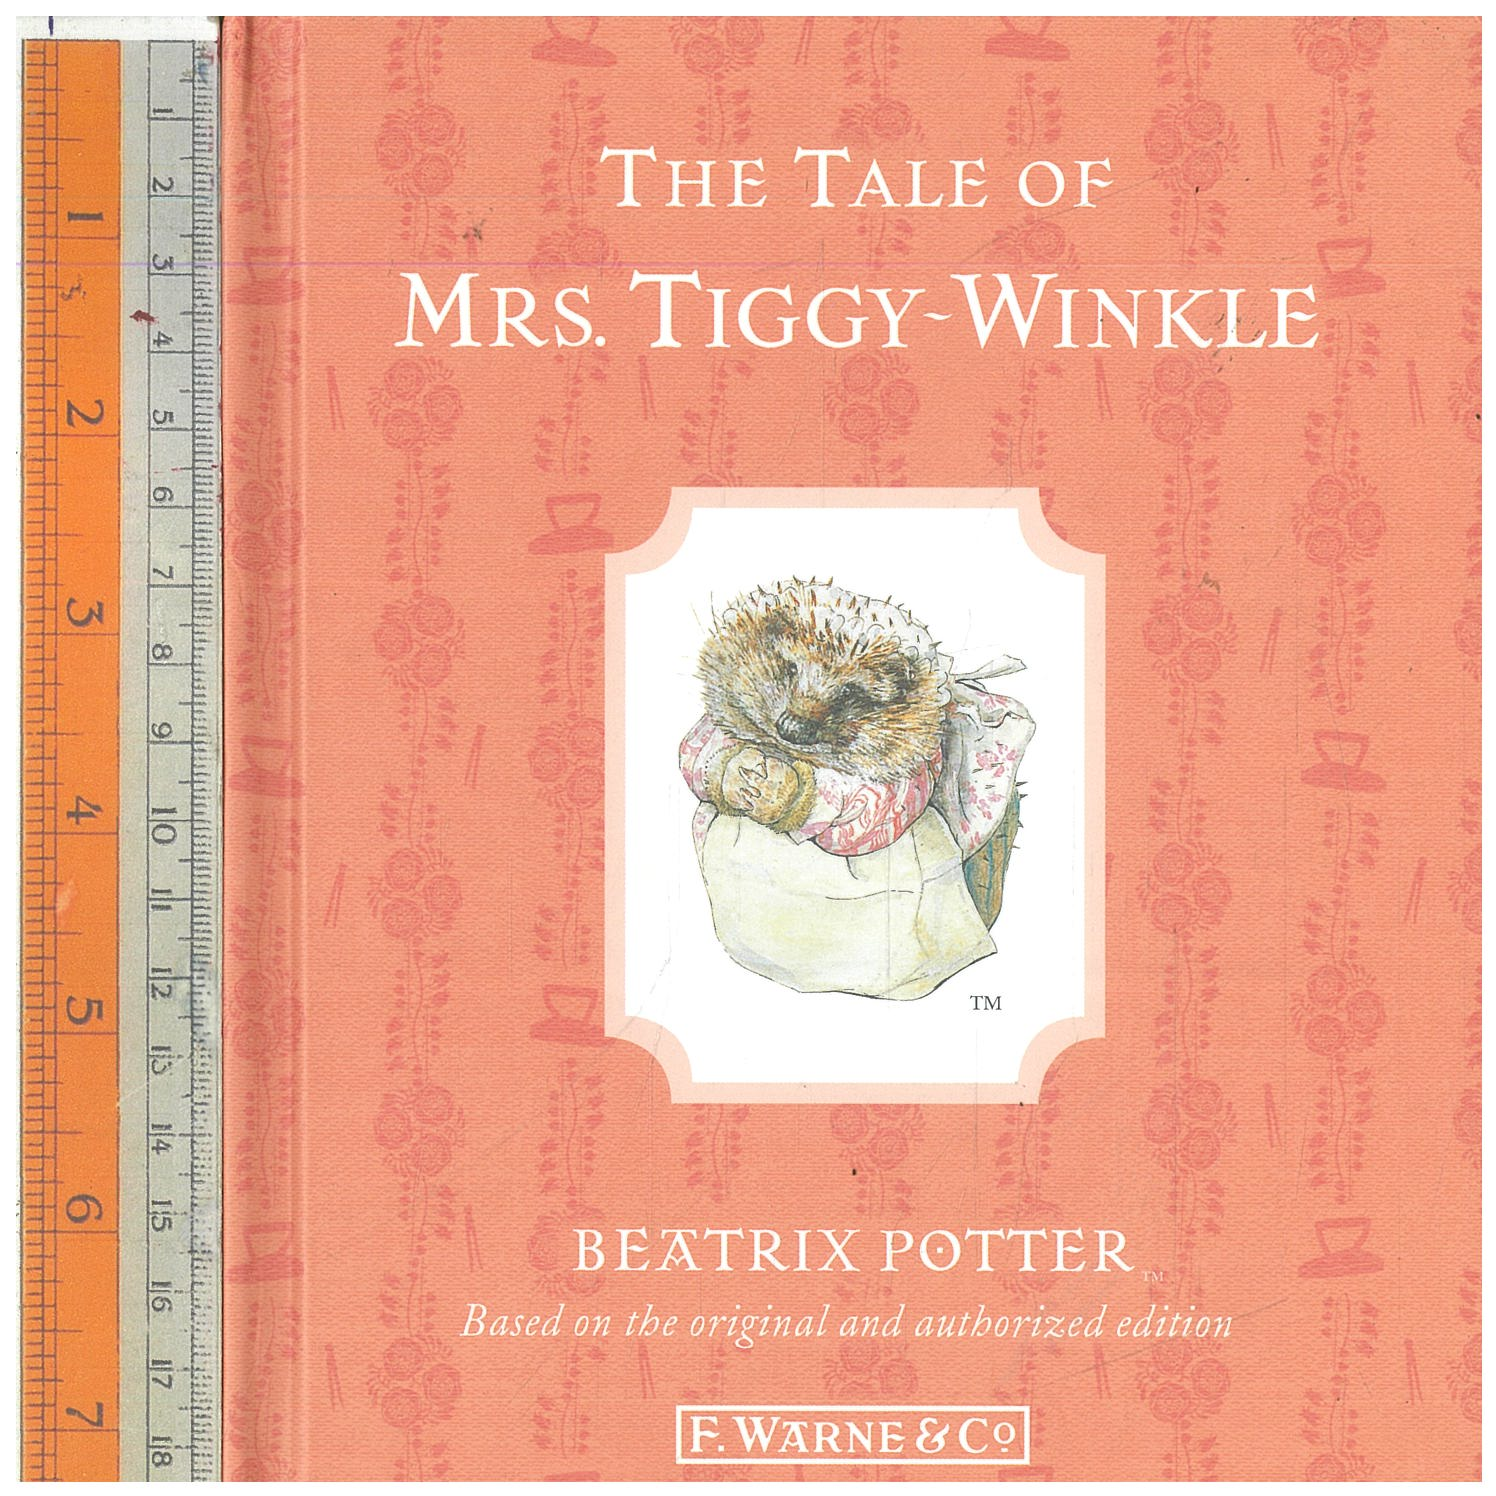 Mrs. tiggy - winkle